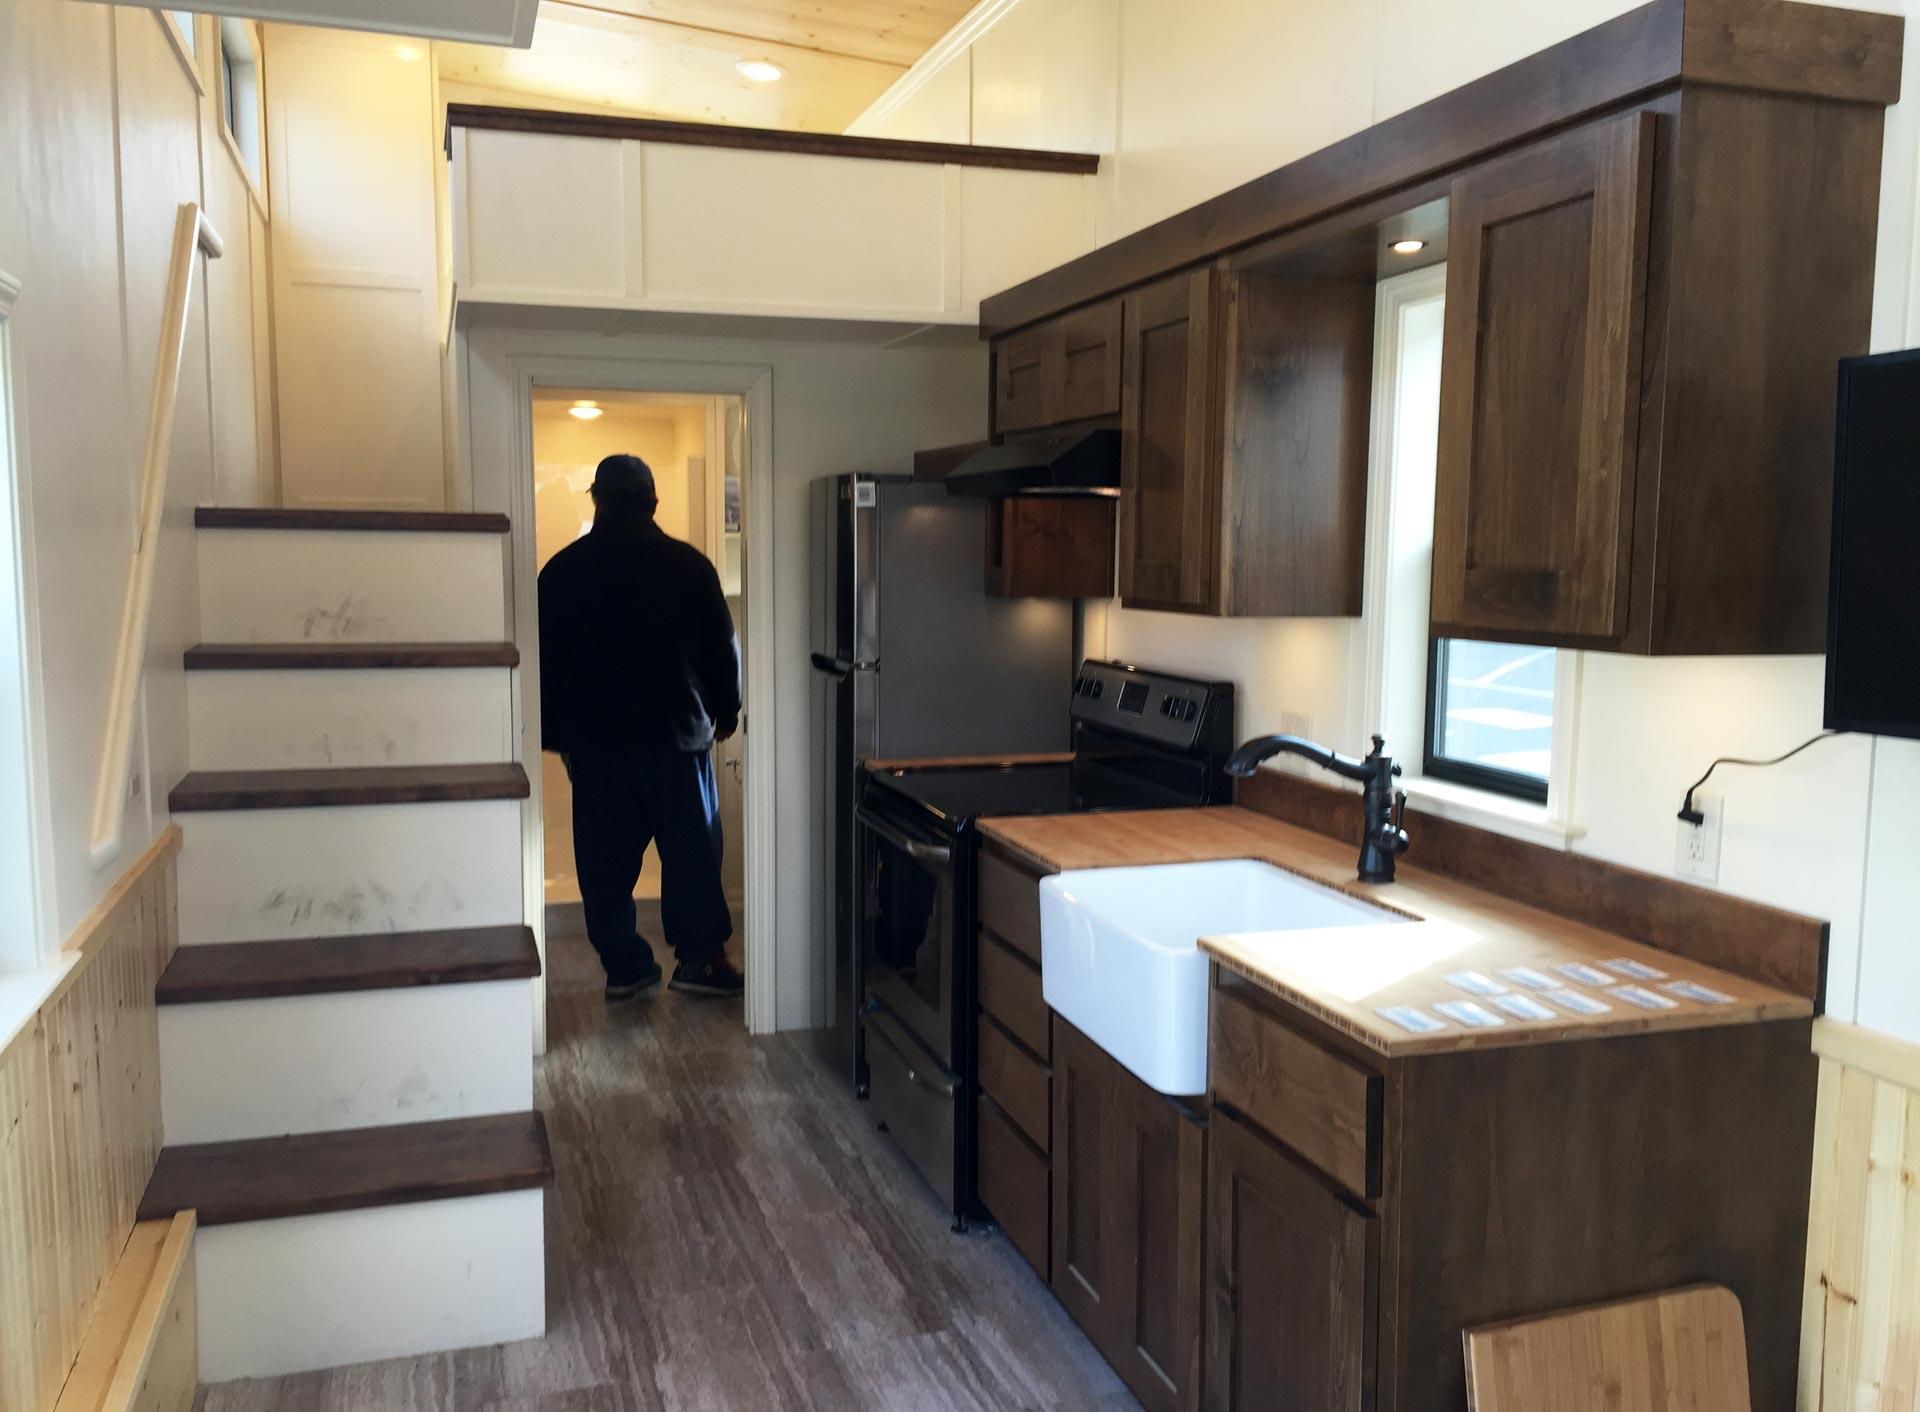 Fresno Passes Groundbreaking Tiny House Rules The California Report KQE